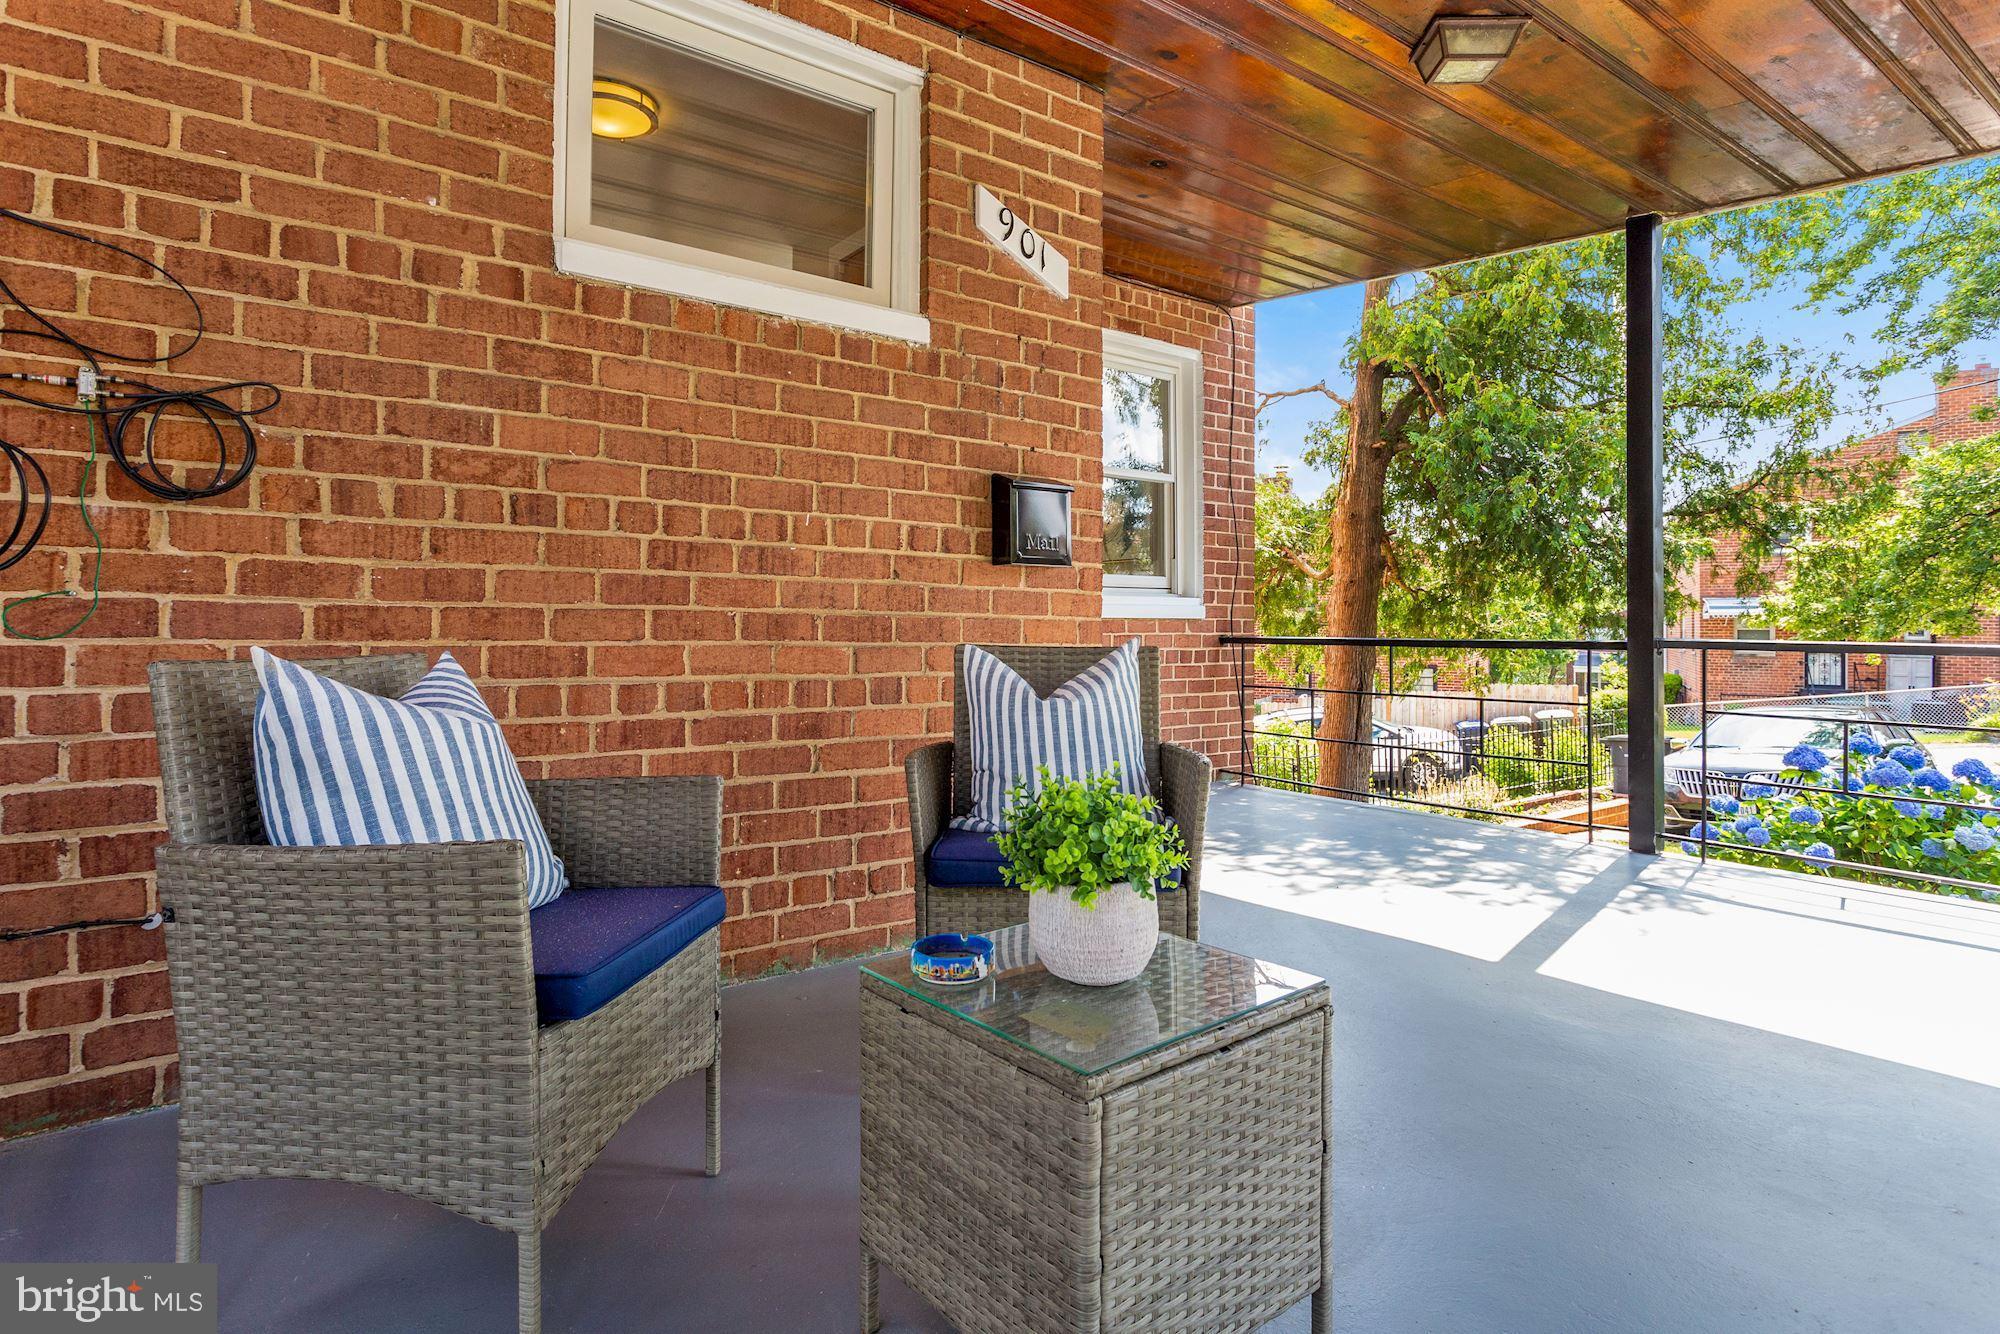 Enjoy indoor and outdoor living in this updated 3 bedroom, 2.5 bathroom semi-detached home on a corn